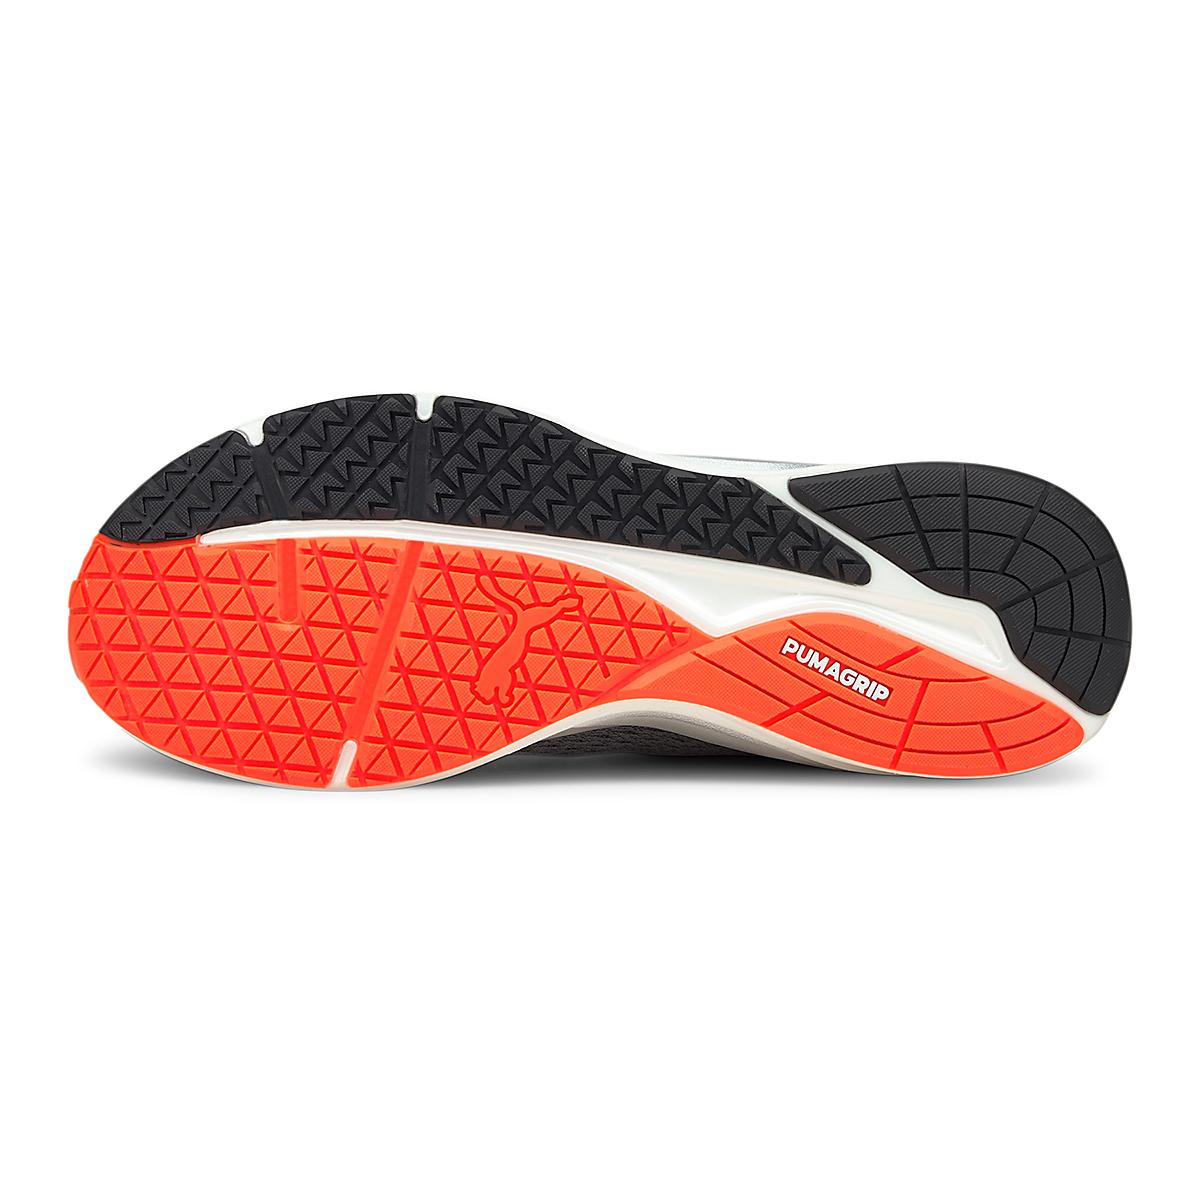 Men's Puma Eternity Nitro Running Shoe - Color: Castlerock / Puma White / Lava Blast - Size: 7 - Width: Regular, Castlerock / Puma White / Lava Blast, large, image 4